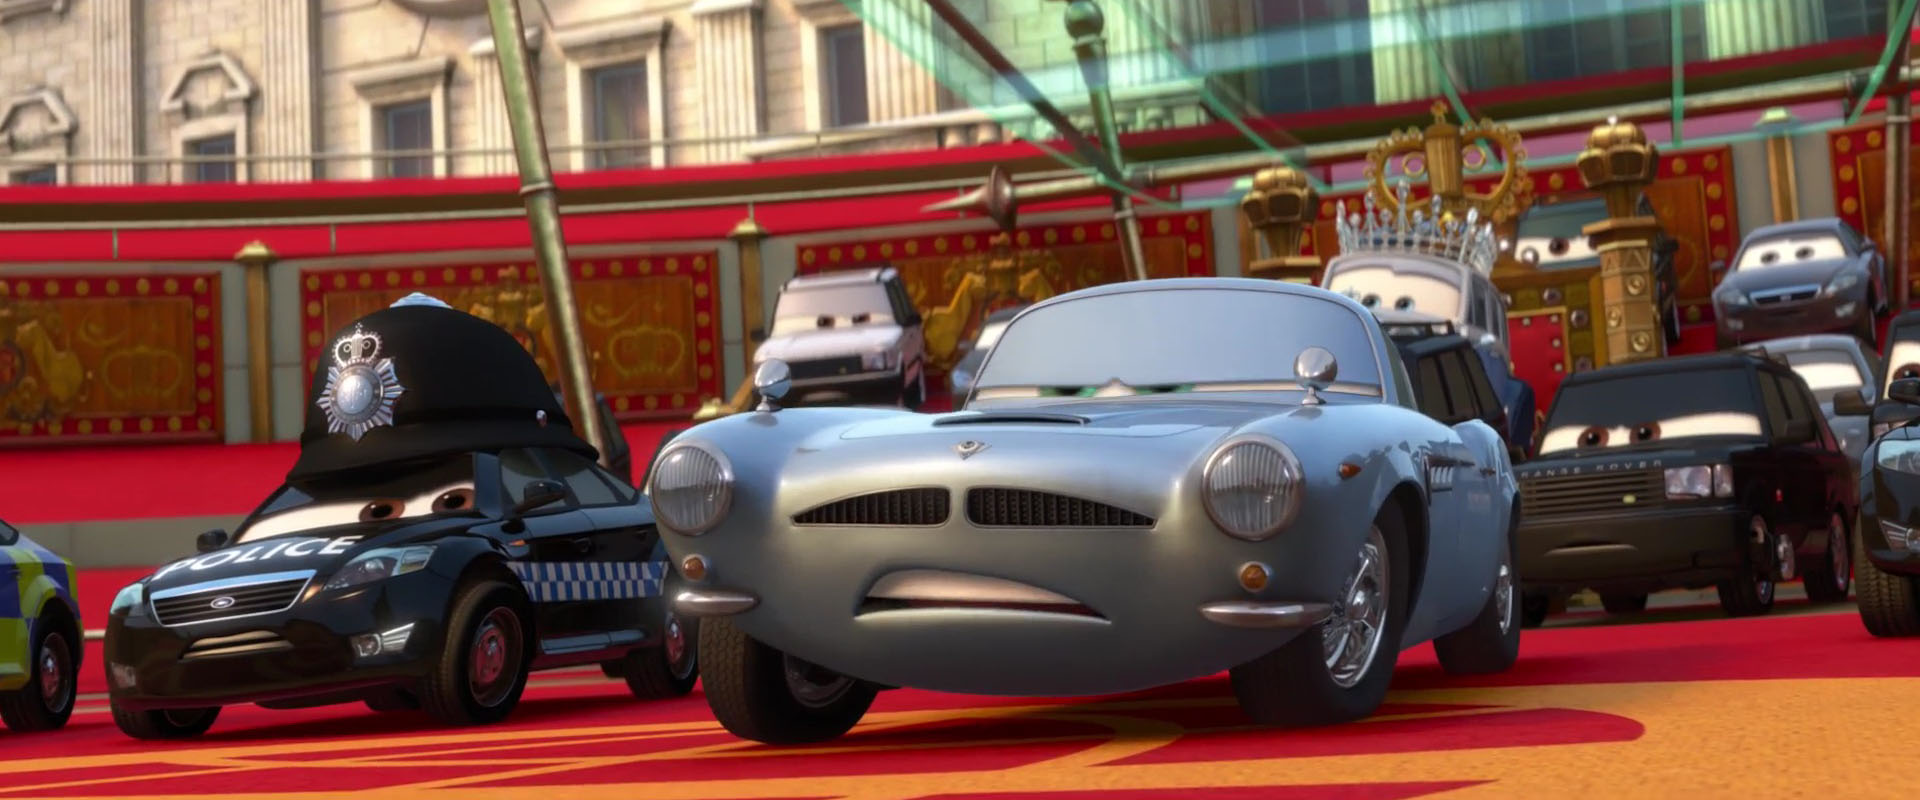 doug speedcheck personnage character pixar disney cars 2